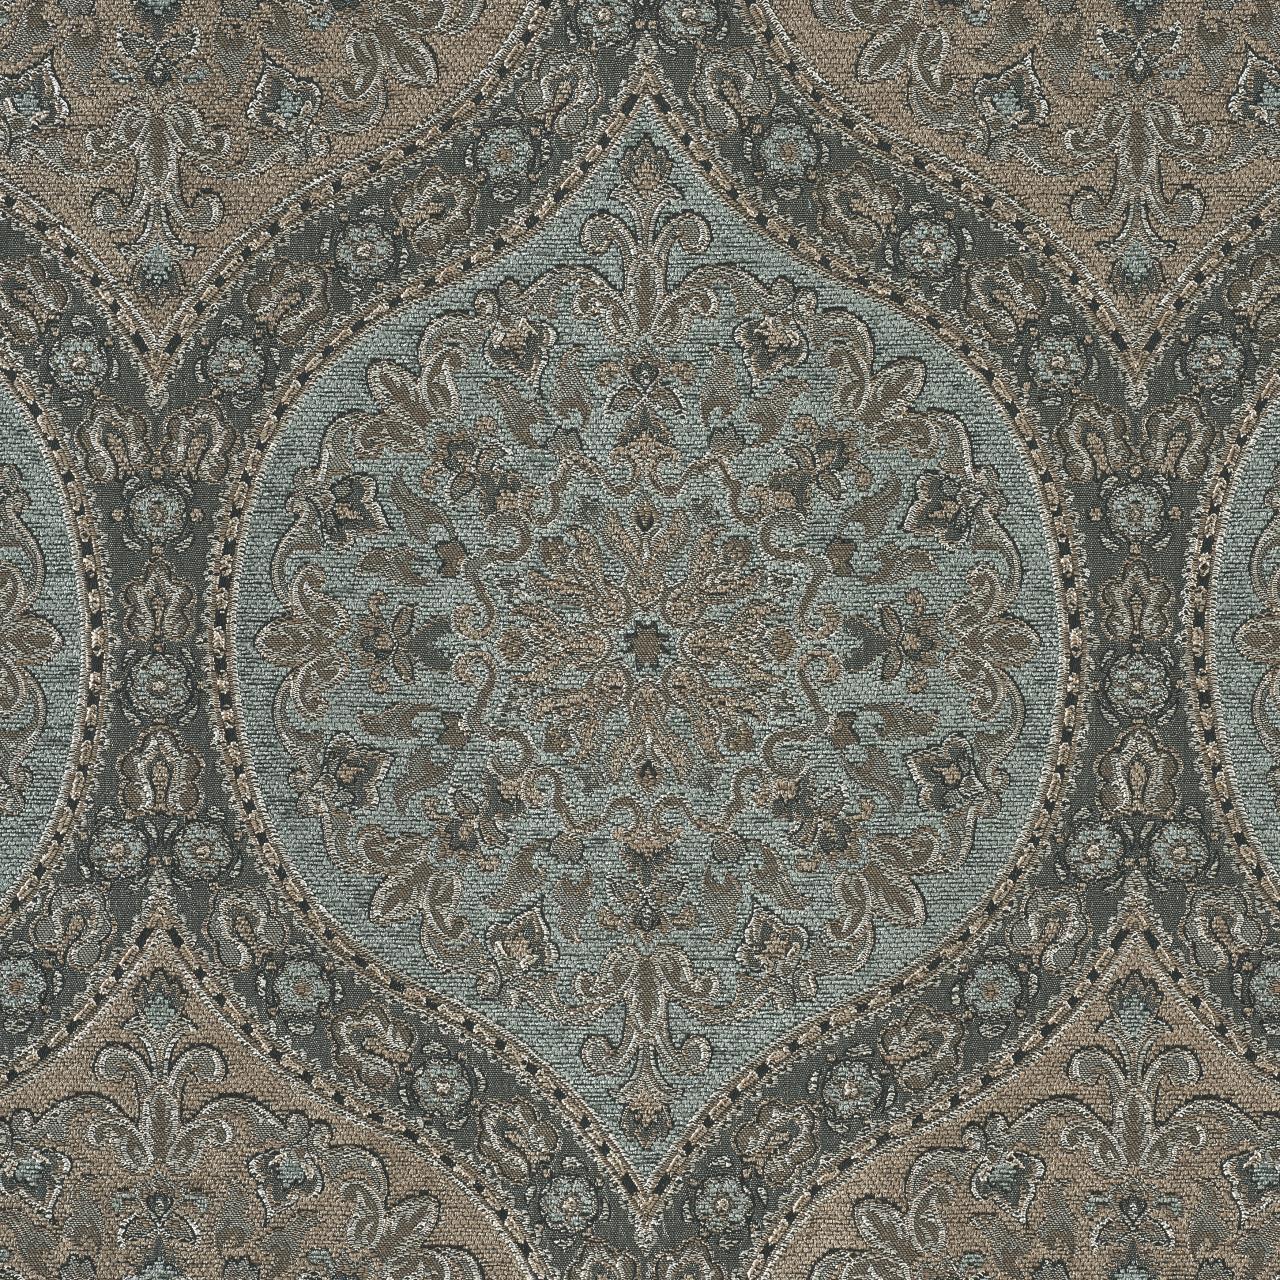 Dorset Spa Comforter Collection -